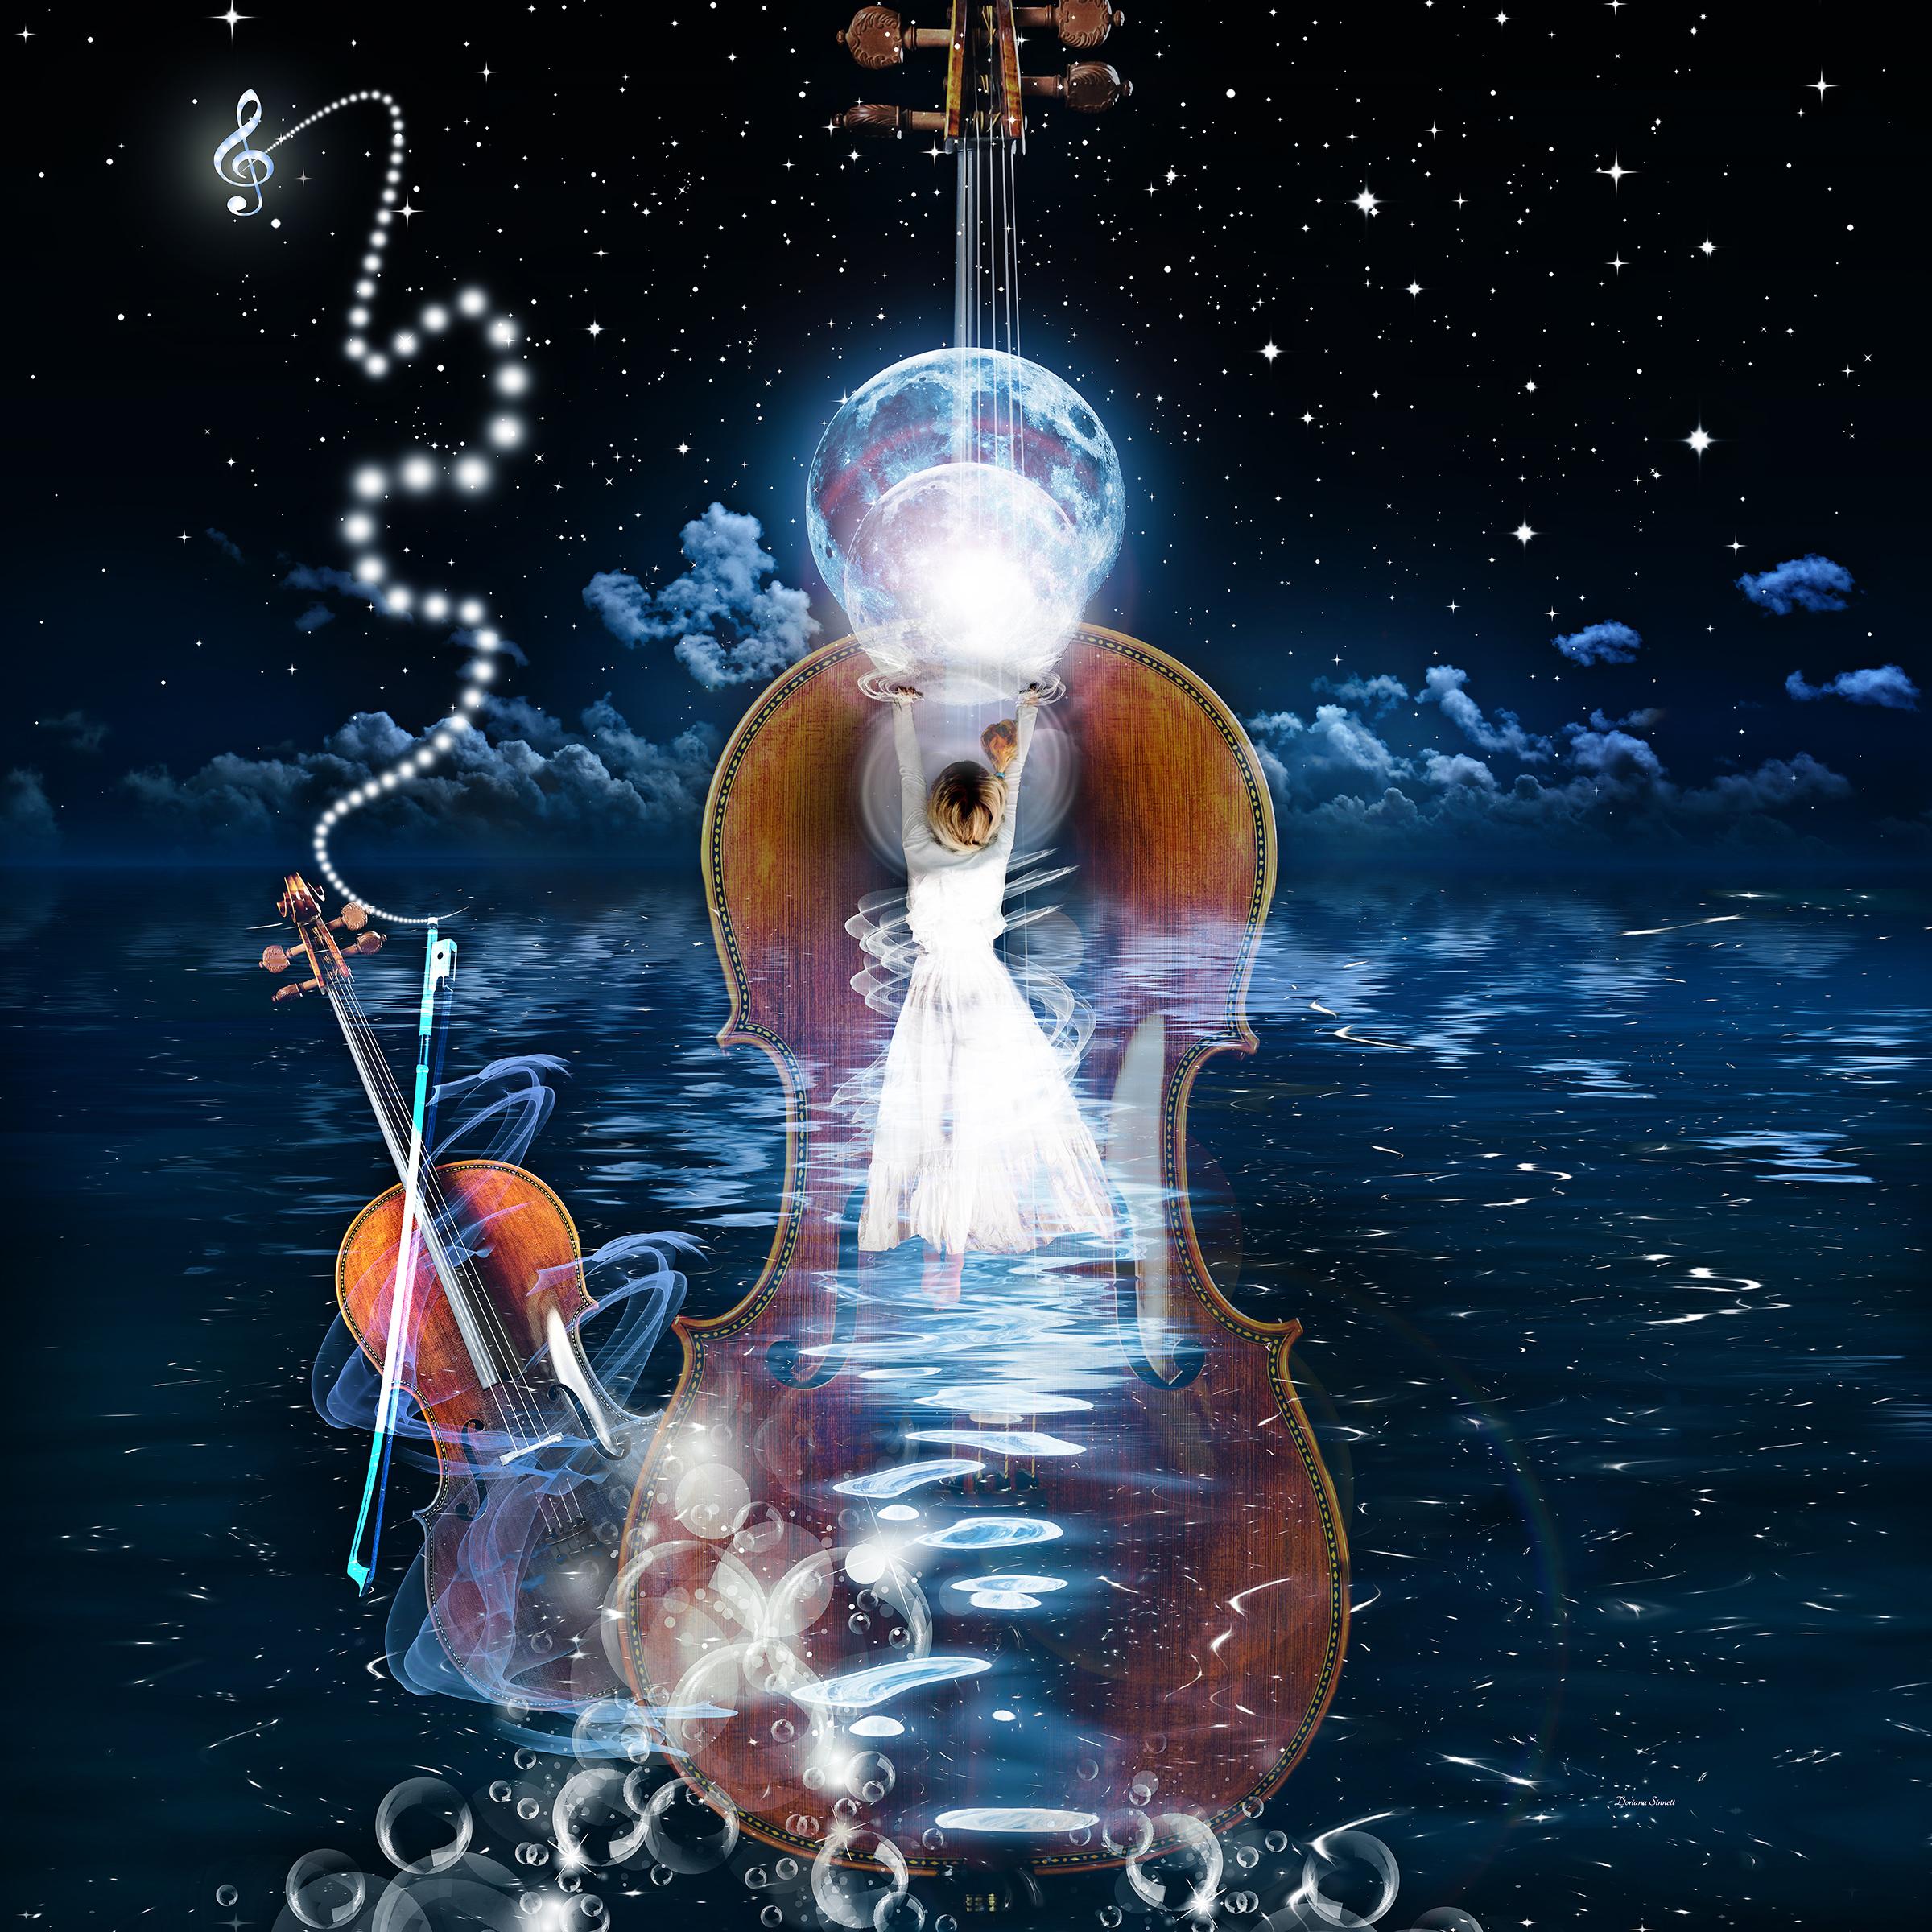 Cello - Moonlight Sonata… BUY  https://artboja.com/art/38vvy2/22209.php